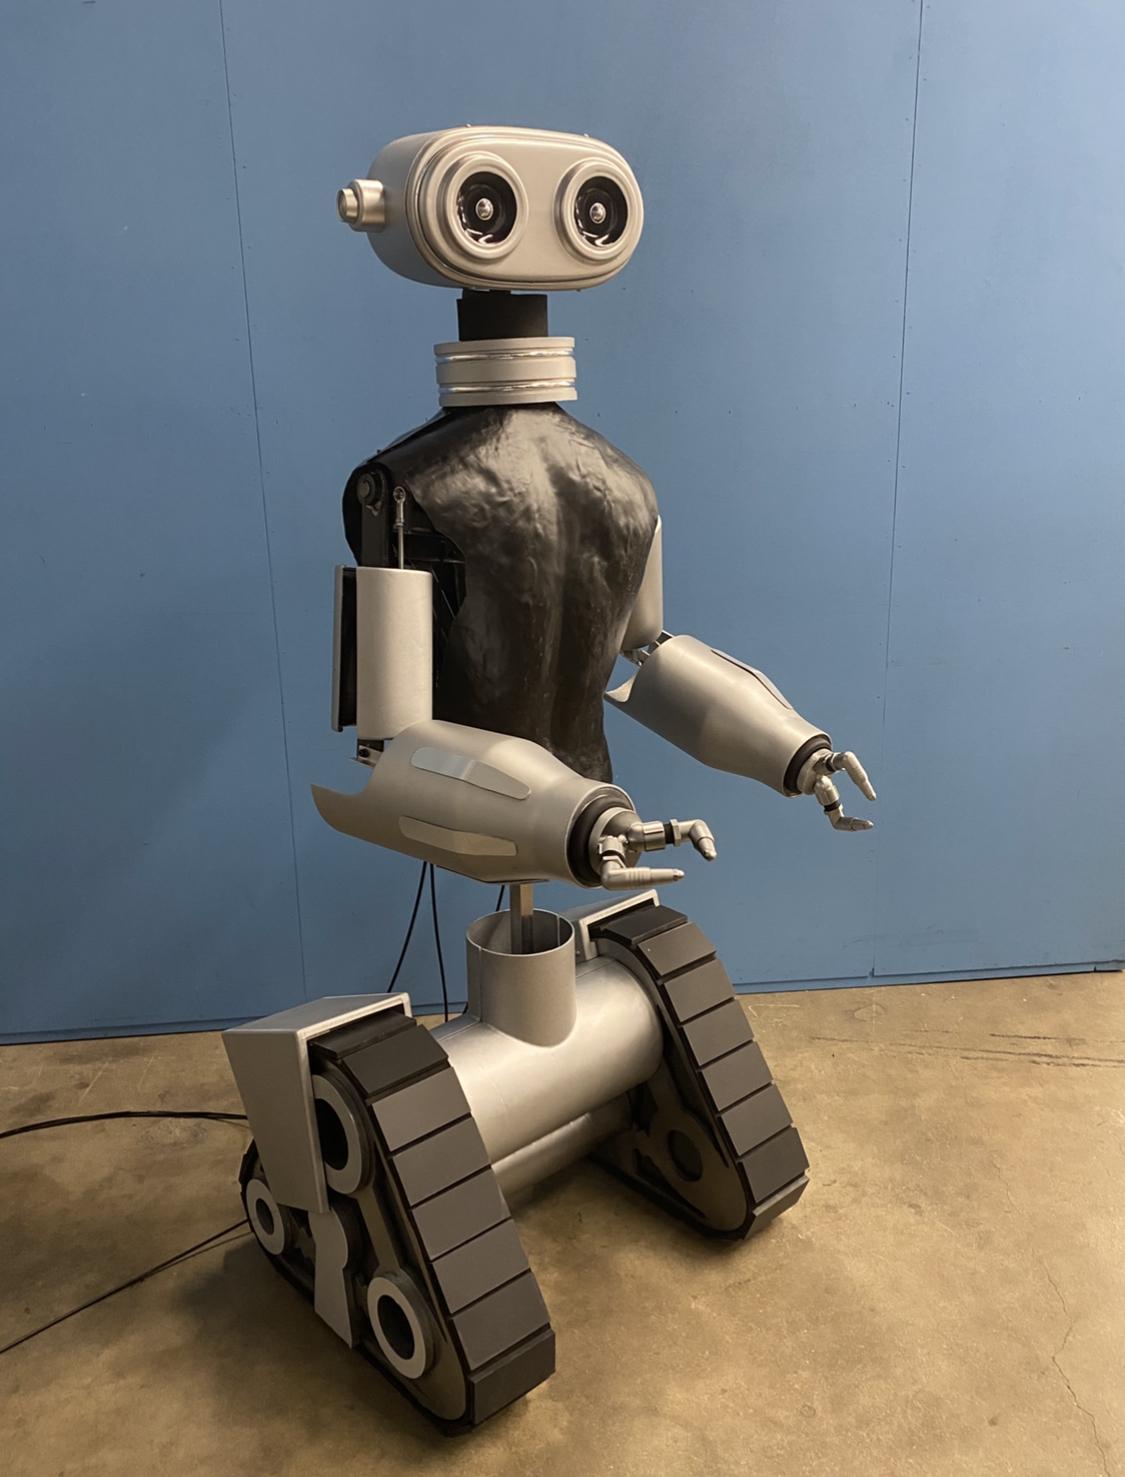 Toyota Robot: Manually operated, shoulder rotation, head tilt.